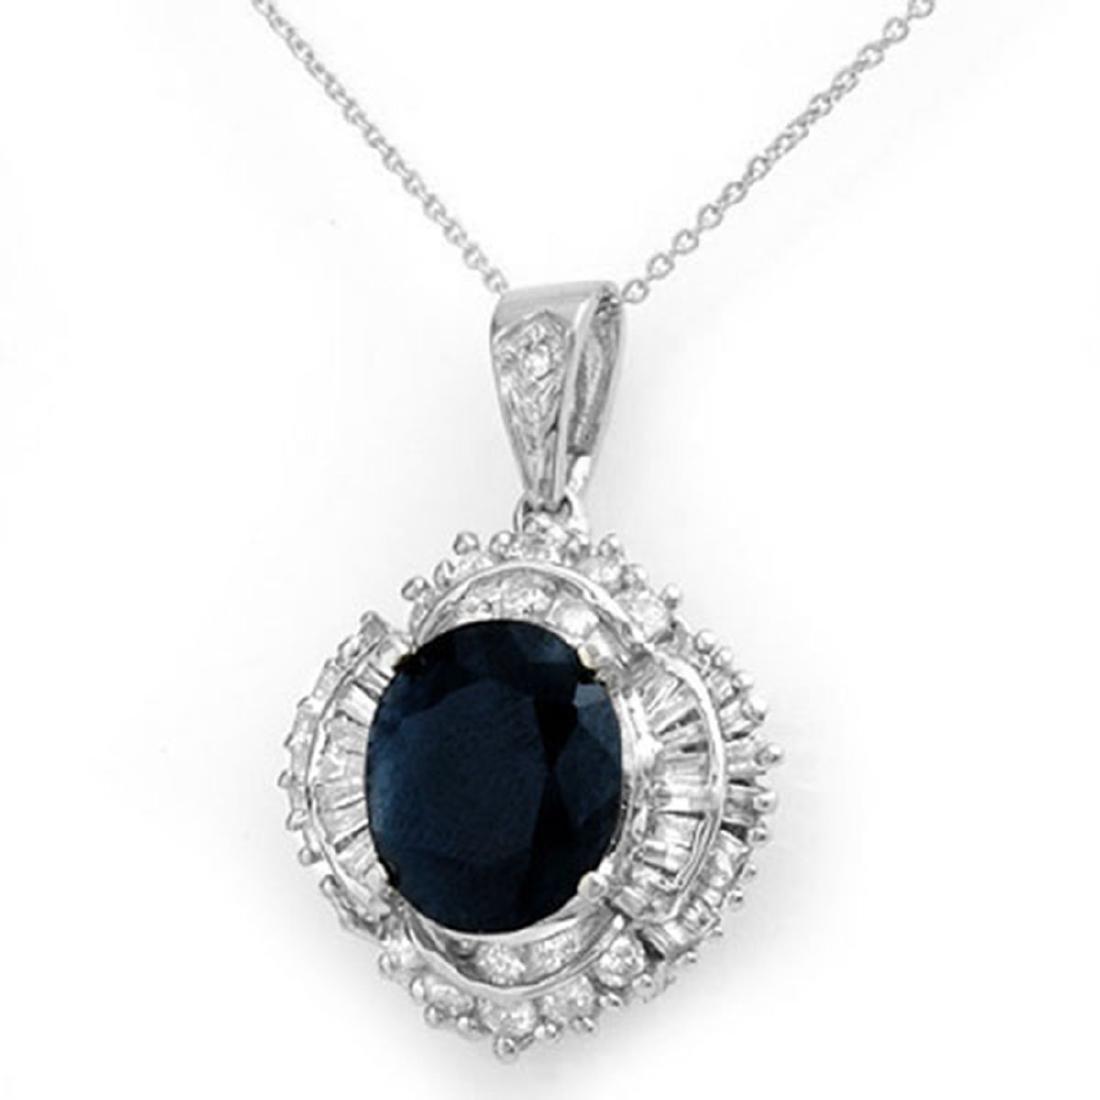 6.53 ctw Blue Sapphire & Diamond Pendant 18K White Gold